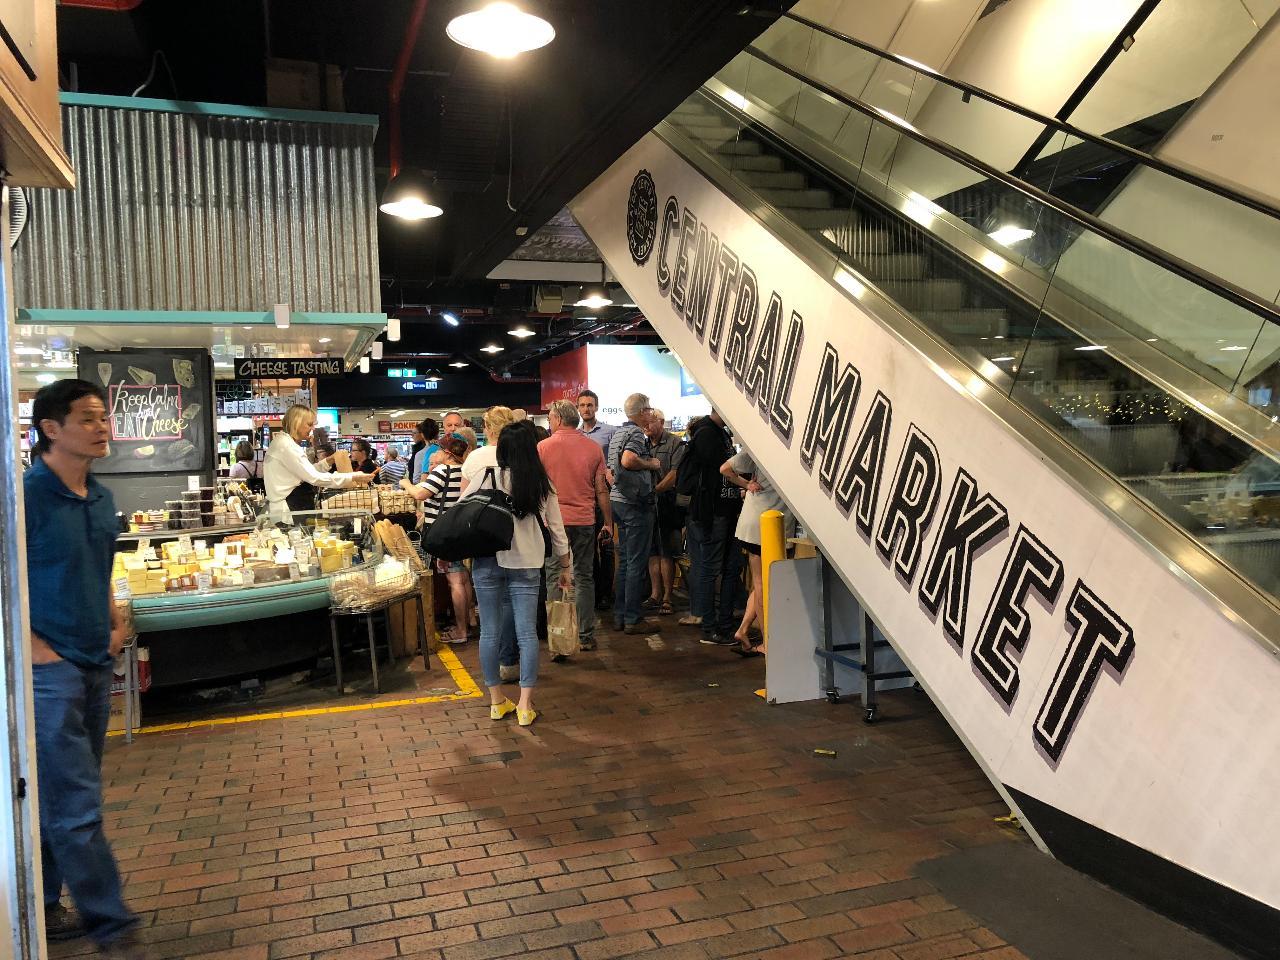 Market Breakfast Tour – Adelaide Central Market